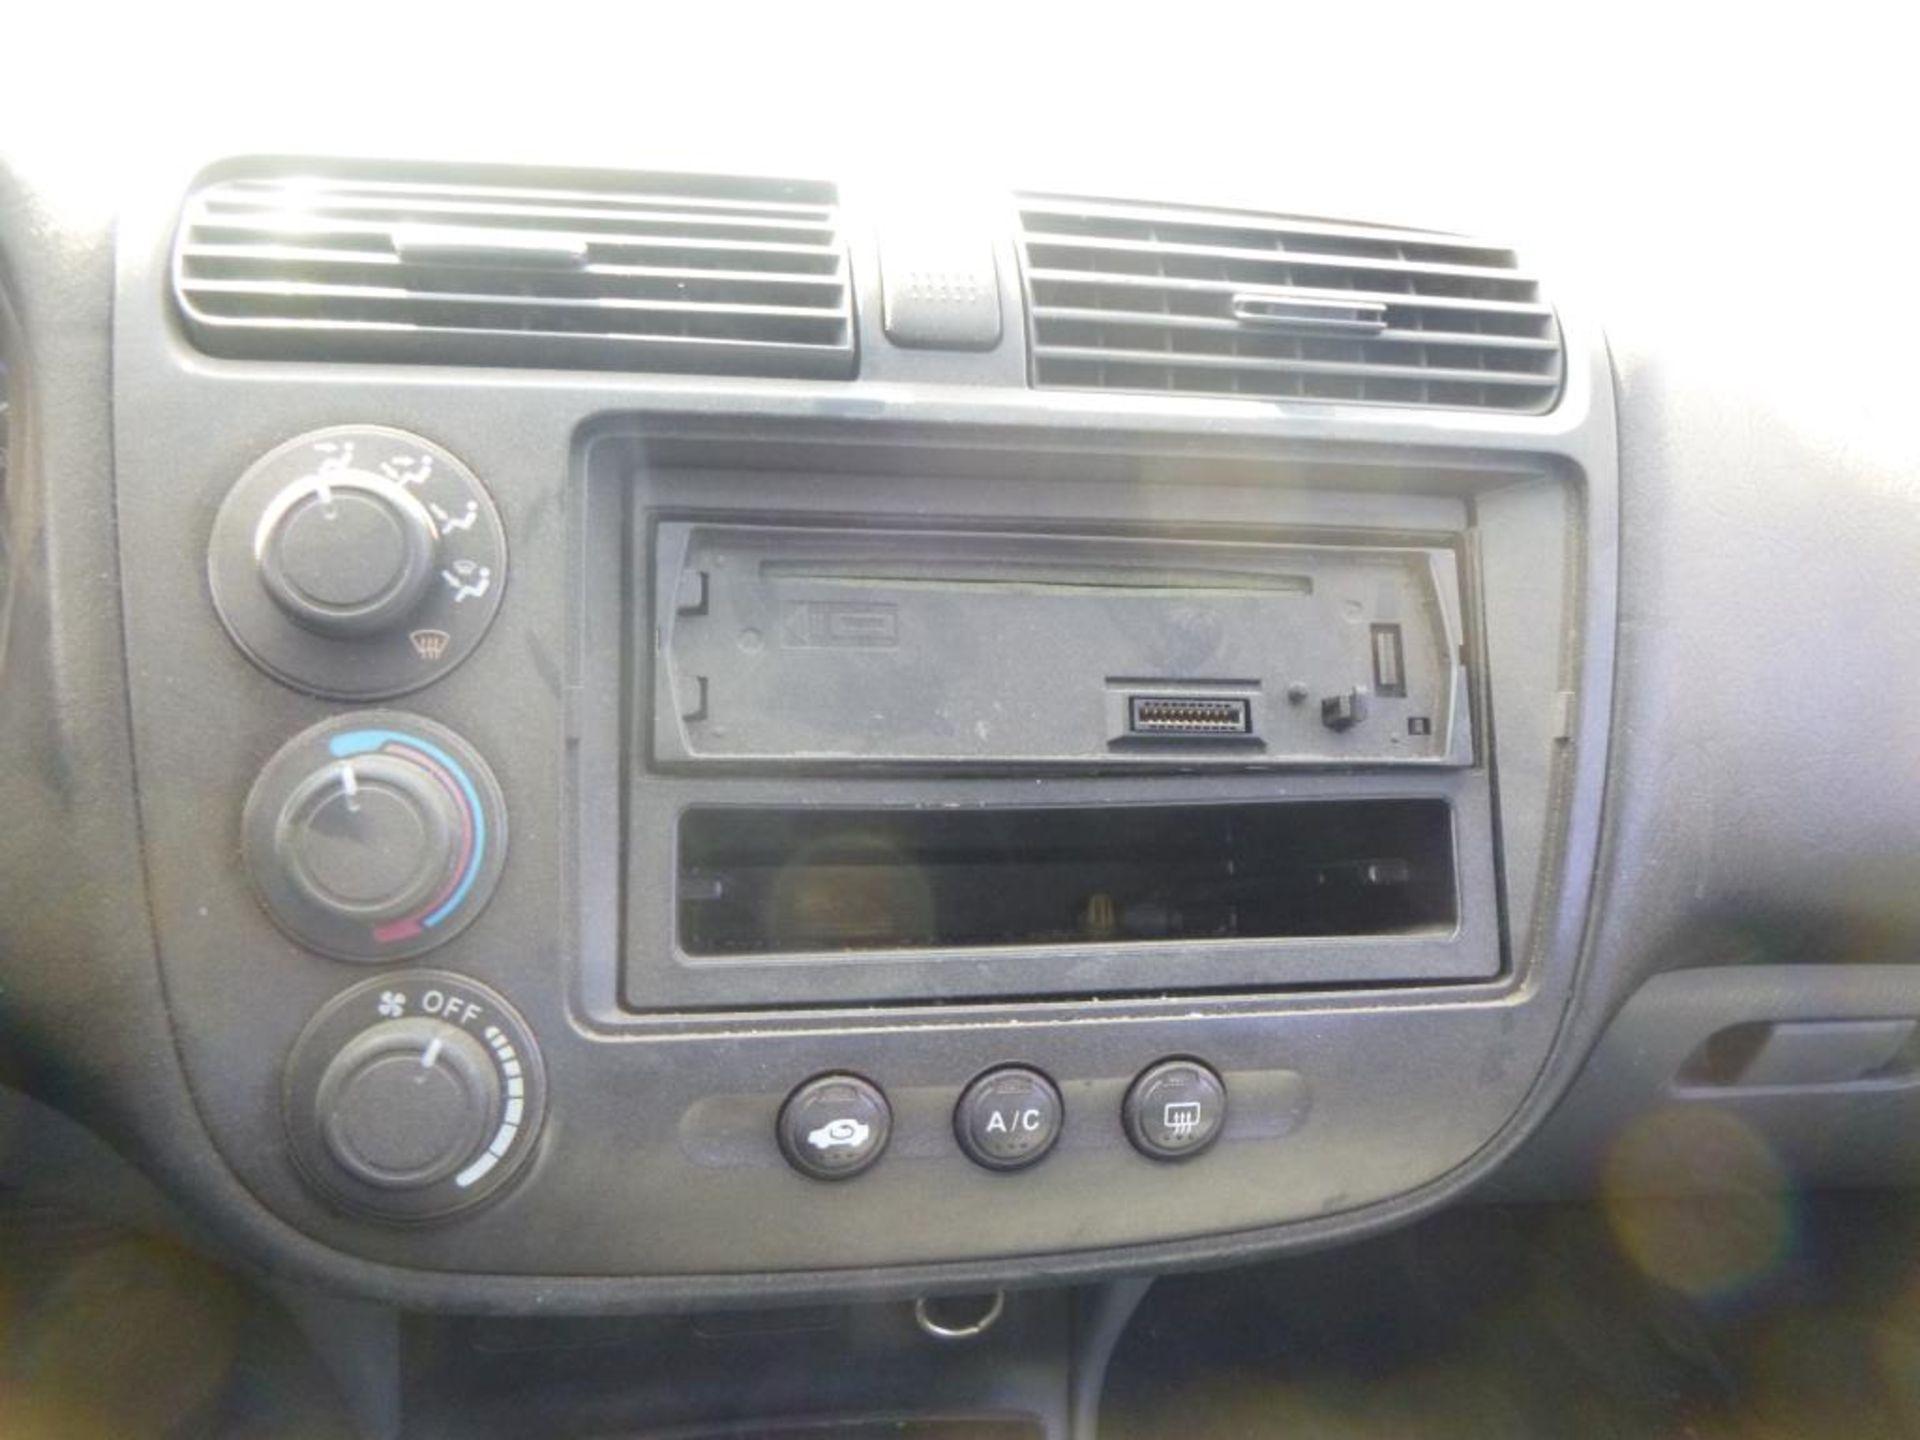 2004 Honda Civic - Image 14 of 14